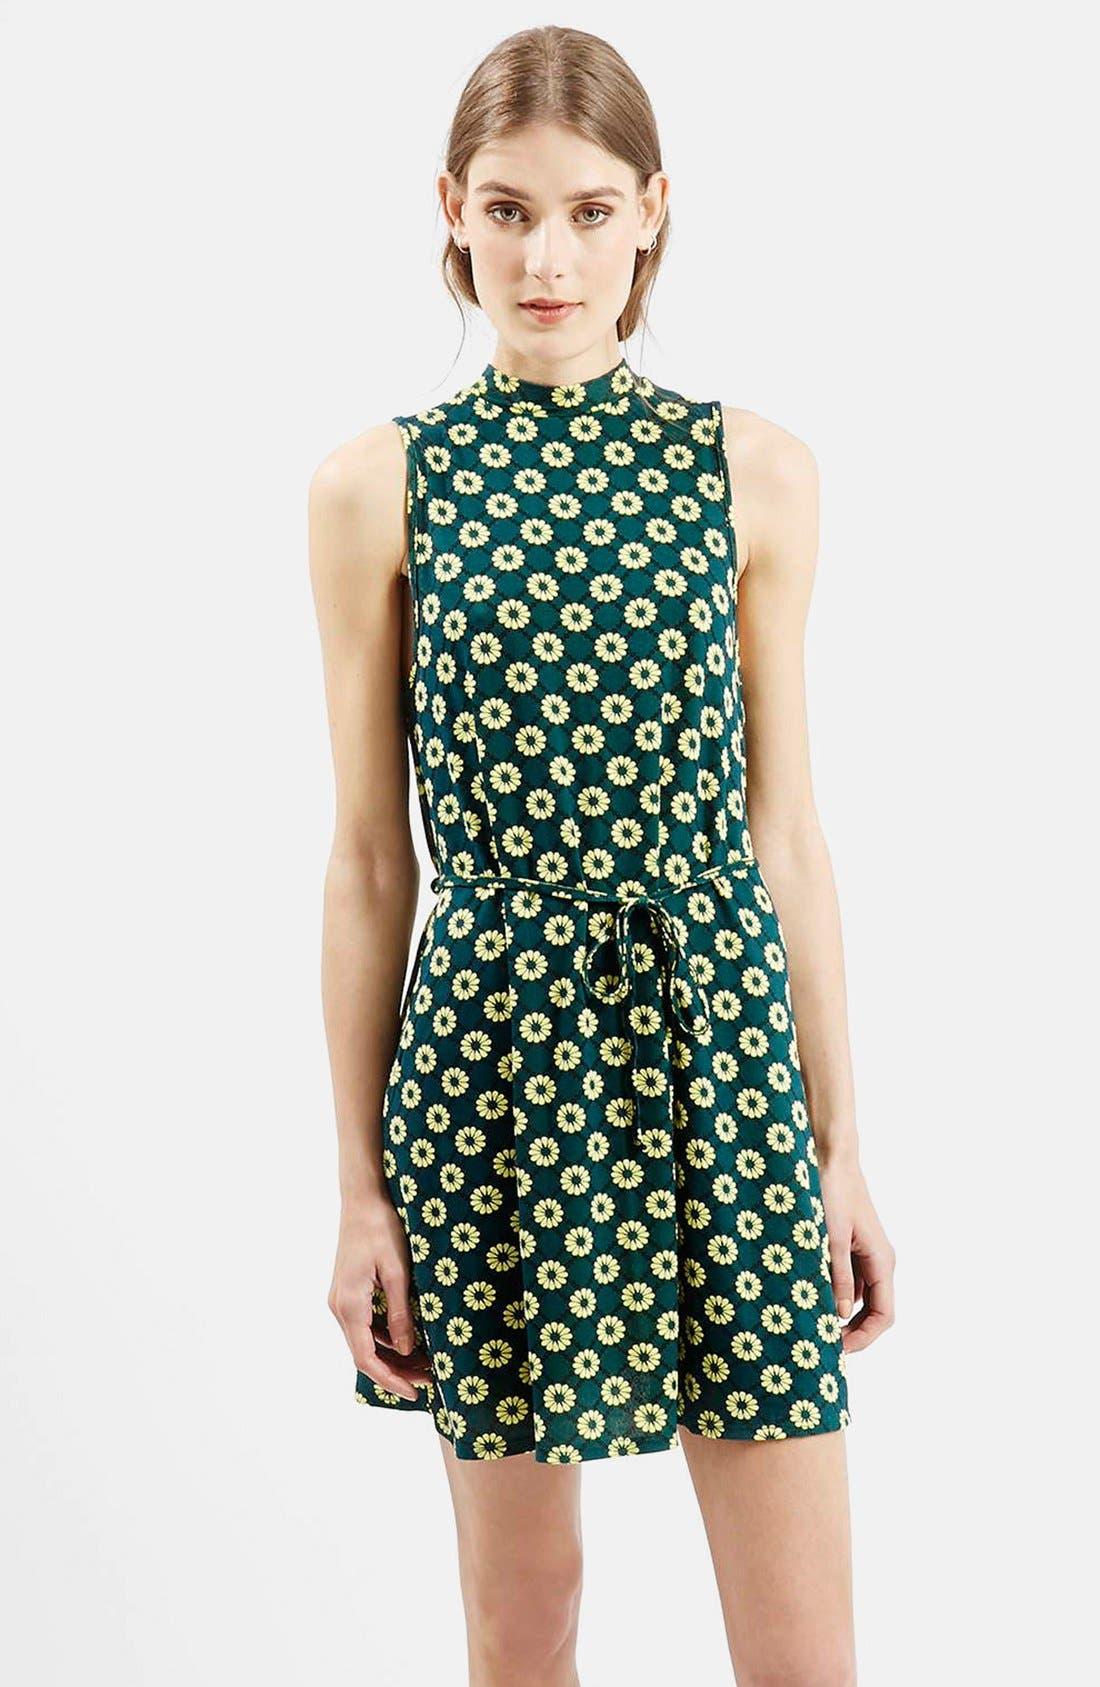 Alternate Image 1 Selected - Topshop 'Scandi' Flippy Sleeveless Dress